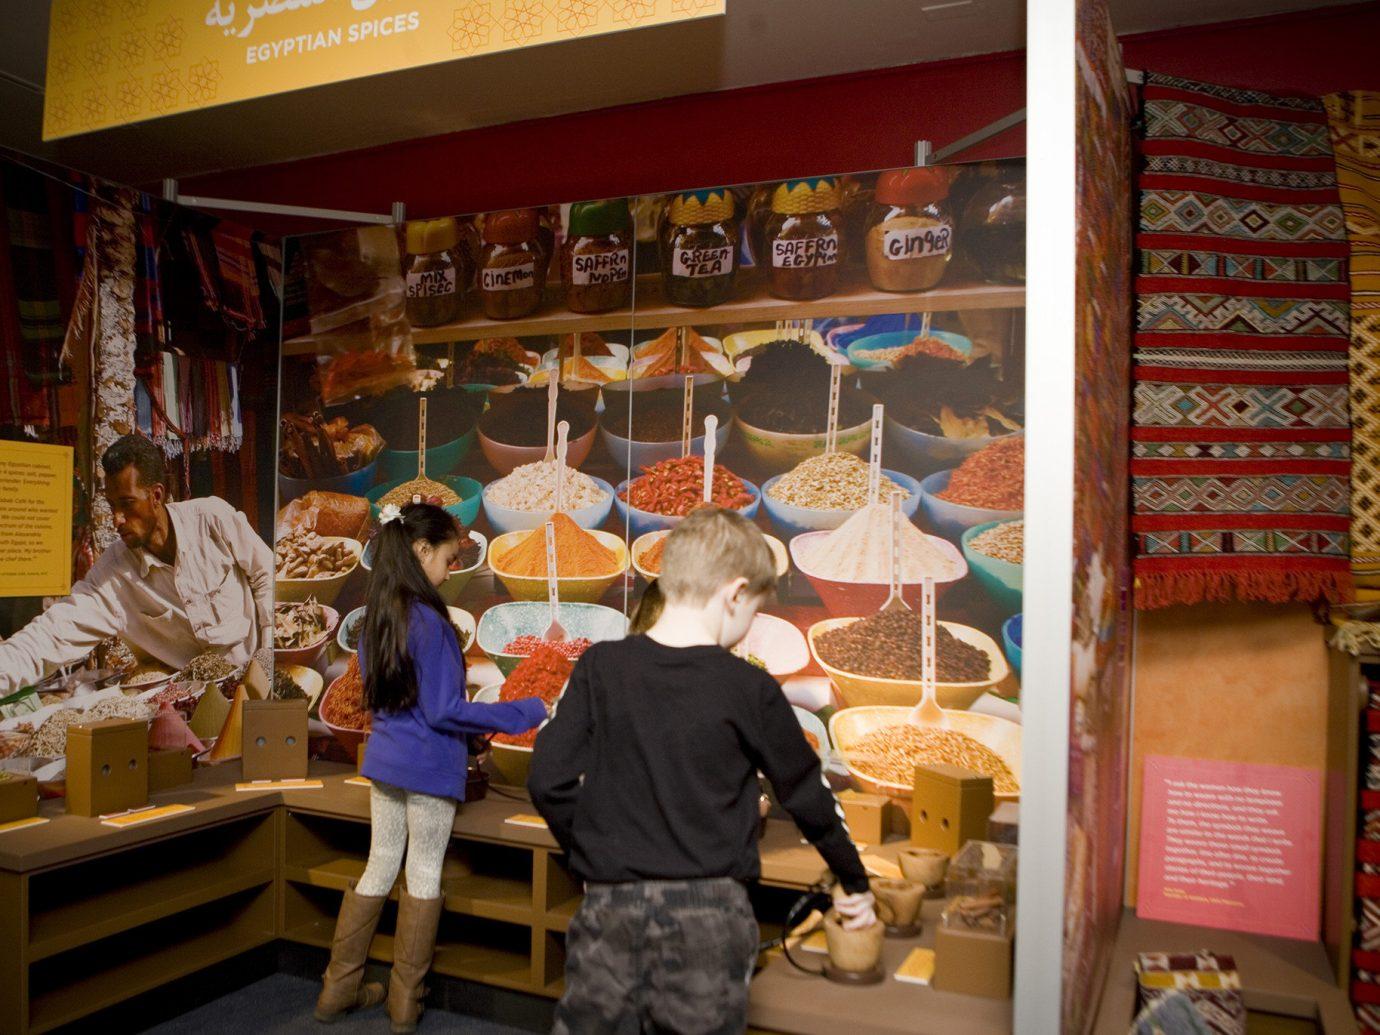 activities Arts + Culture Budget children Family activities fun interior learning Museums people indoor fair stall bakery bazaar store Shop